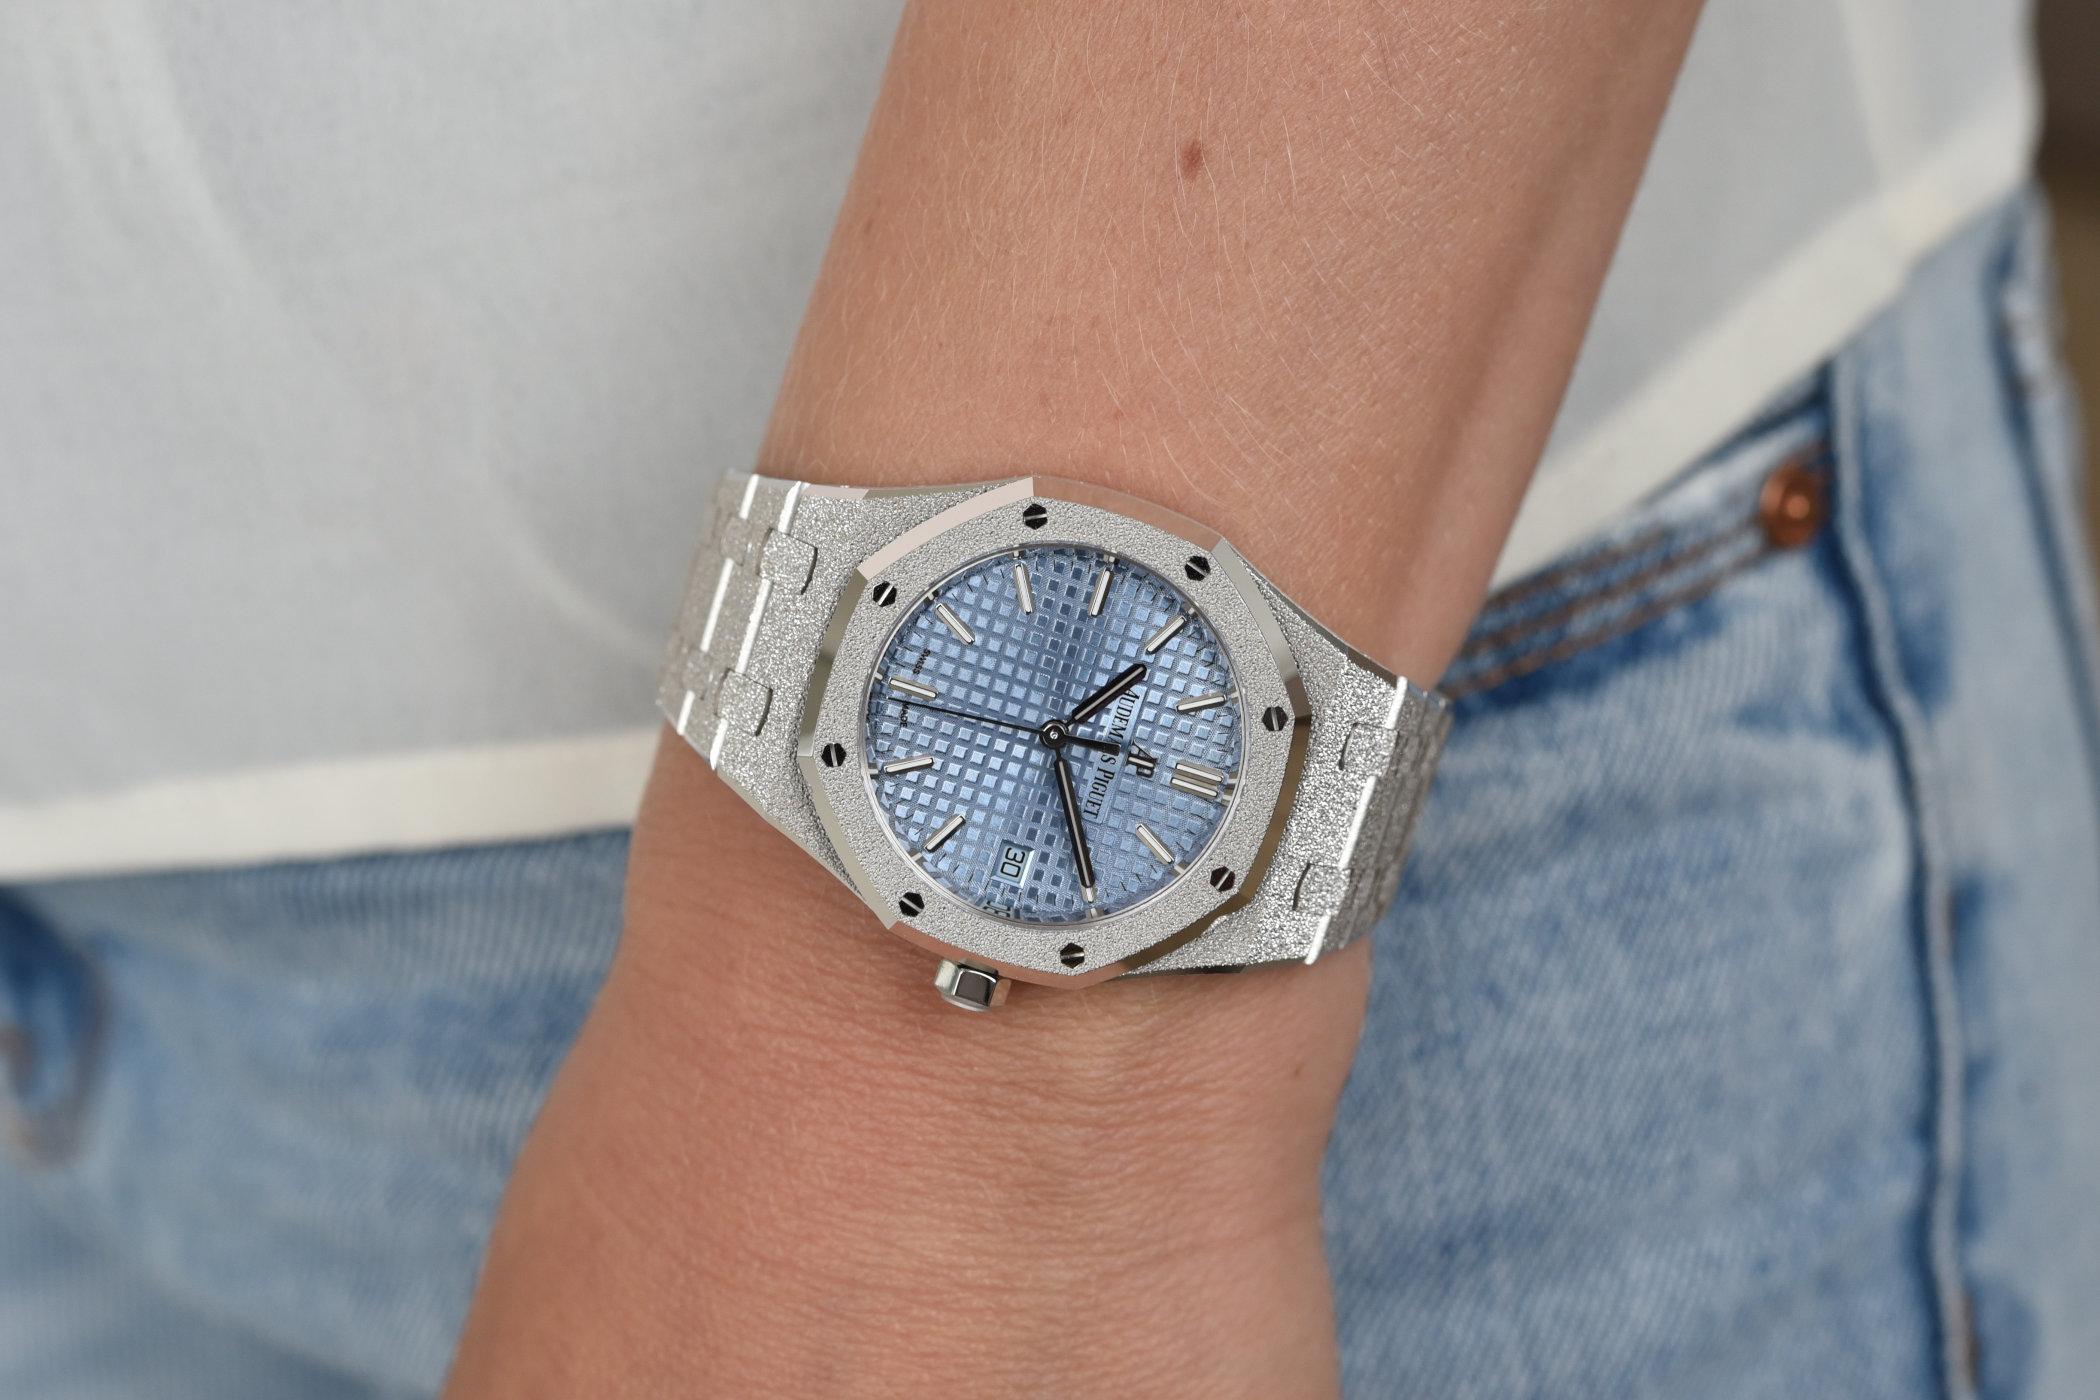 The Audemars Piguet Royal Oak Frosted Gold Selfwinding 34mm - Monochrome Watches